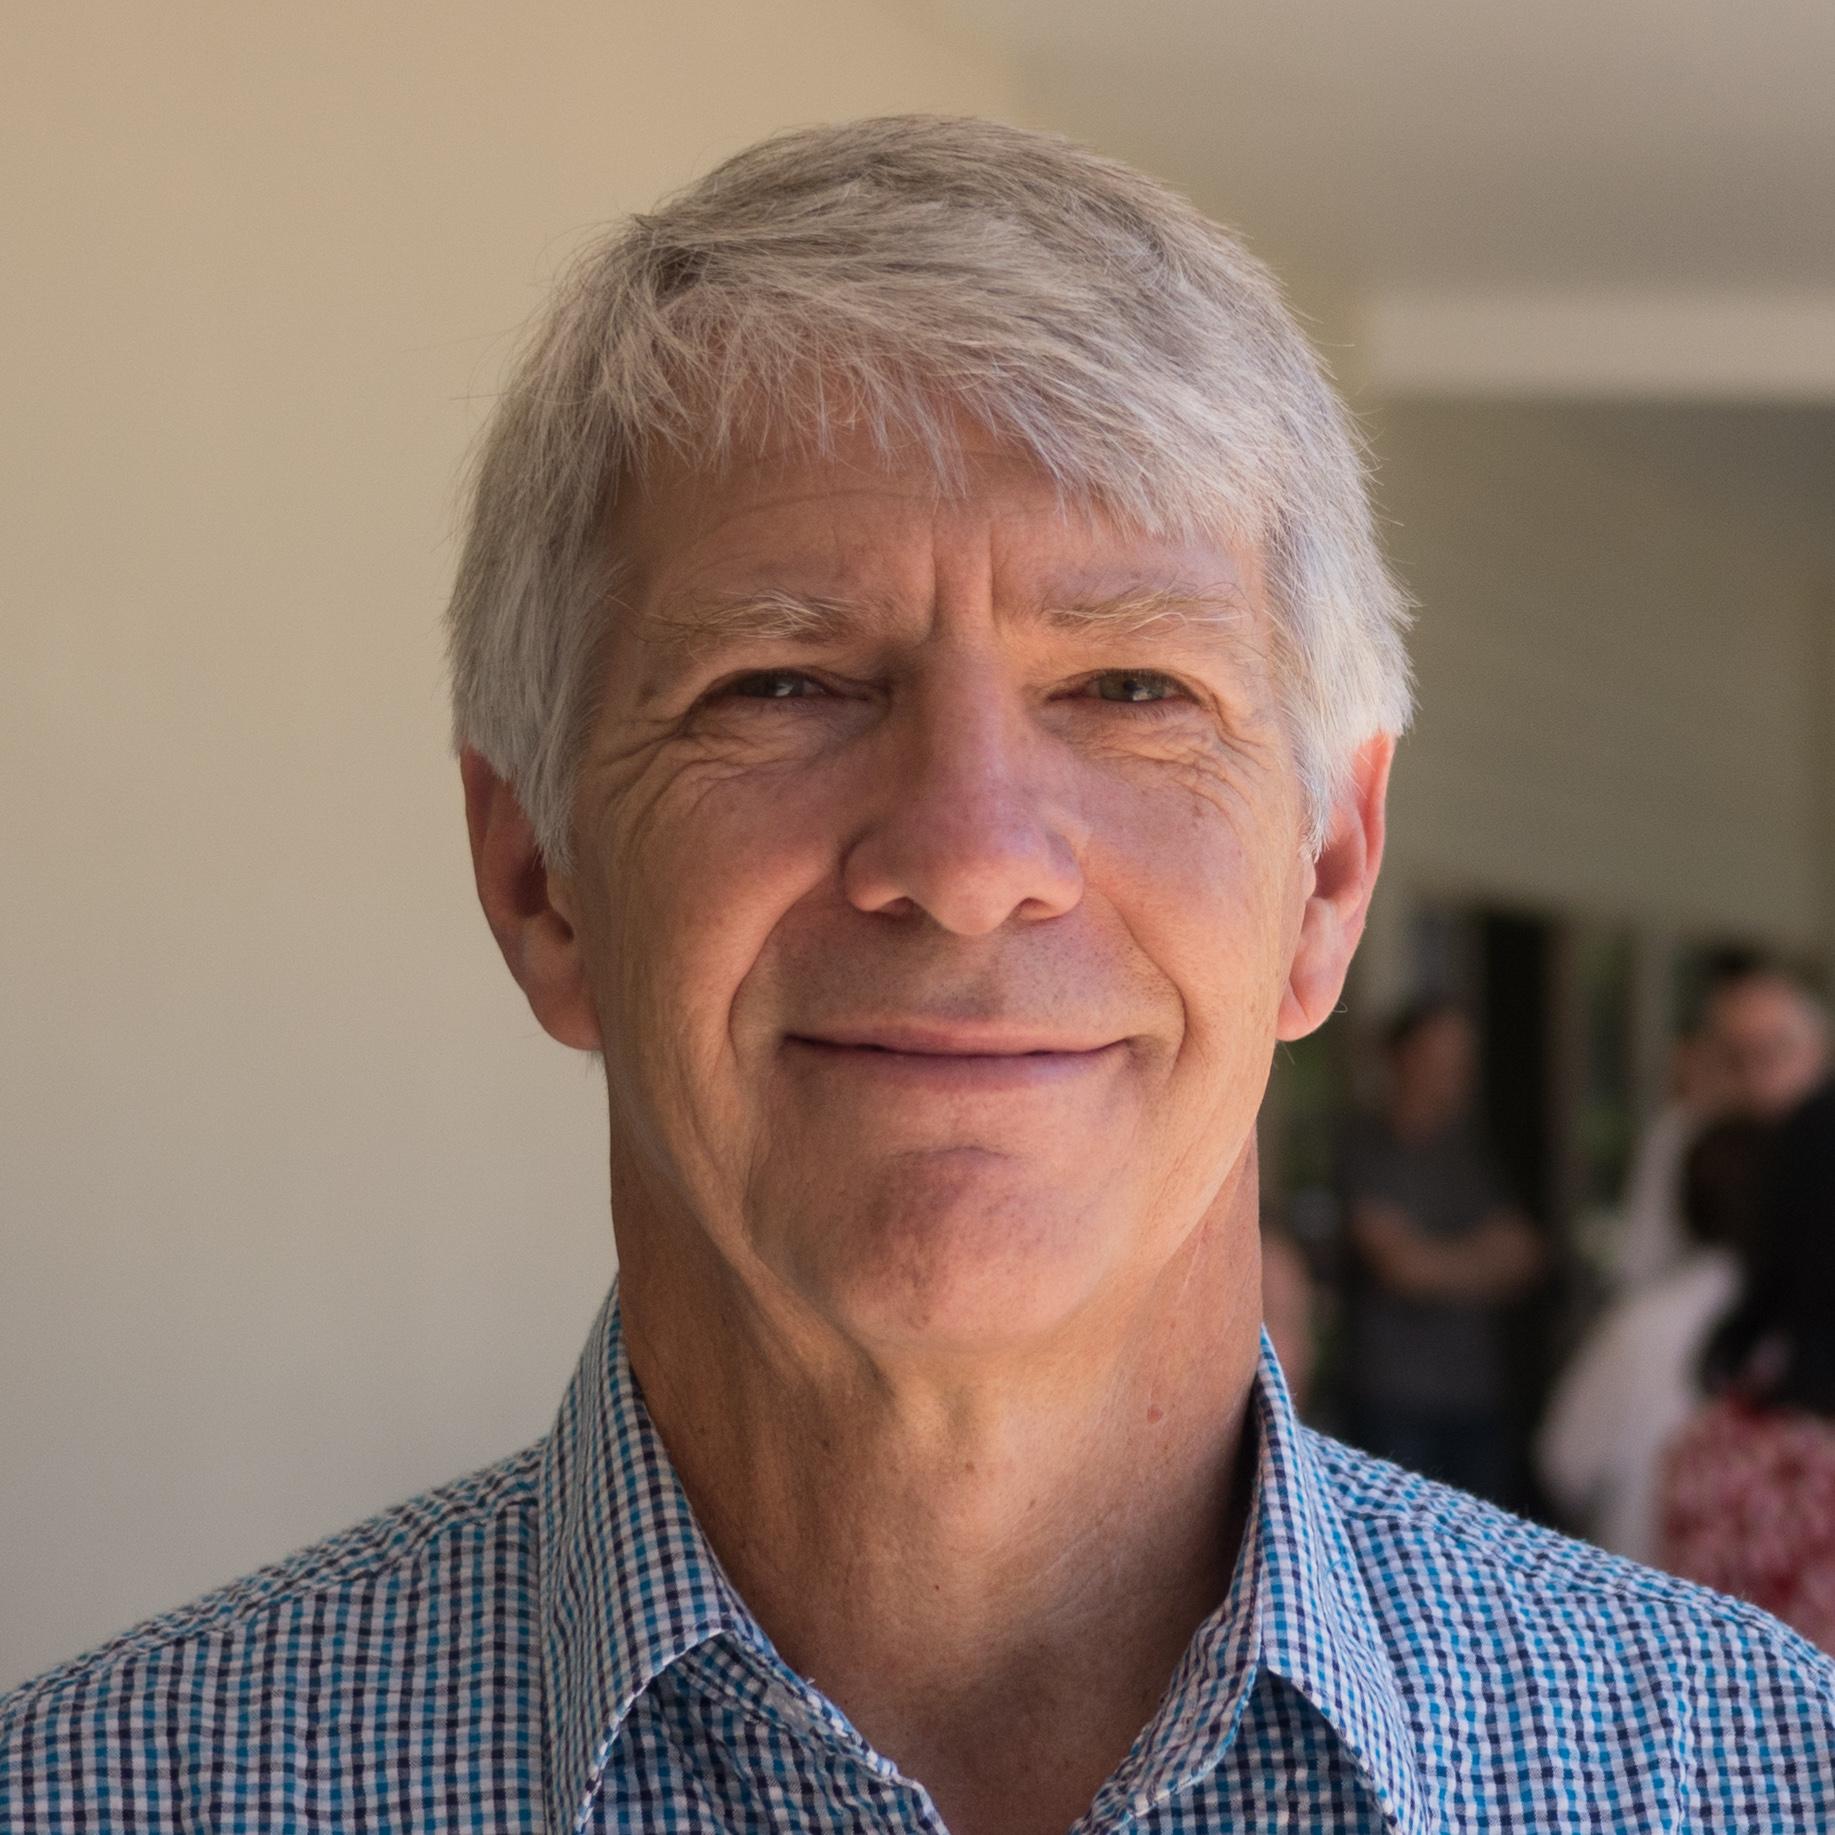 Geoff Perkins